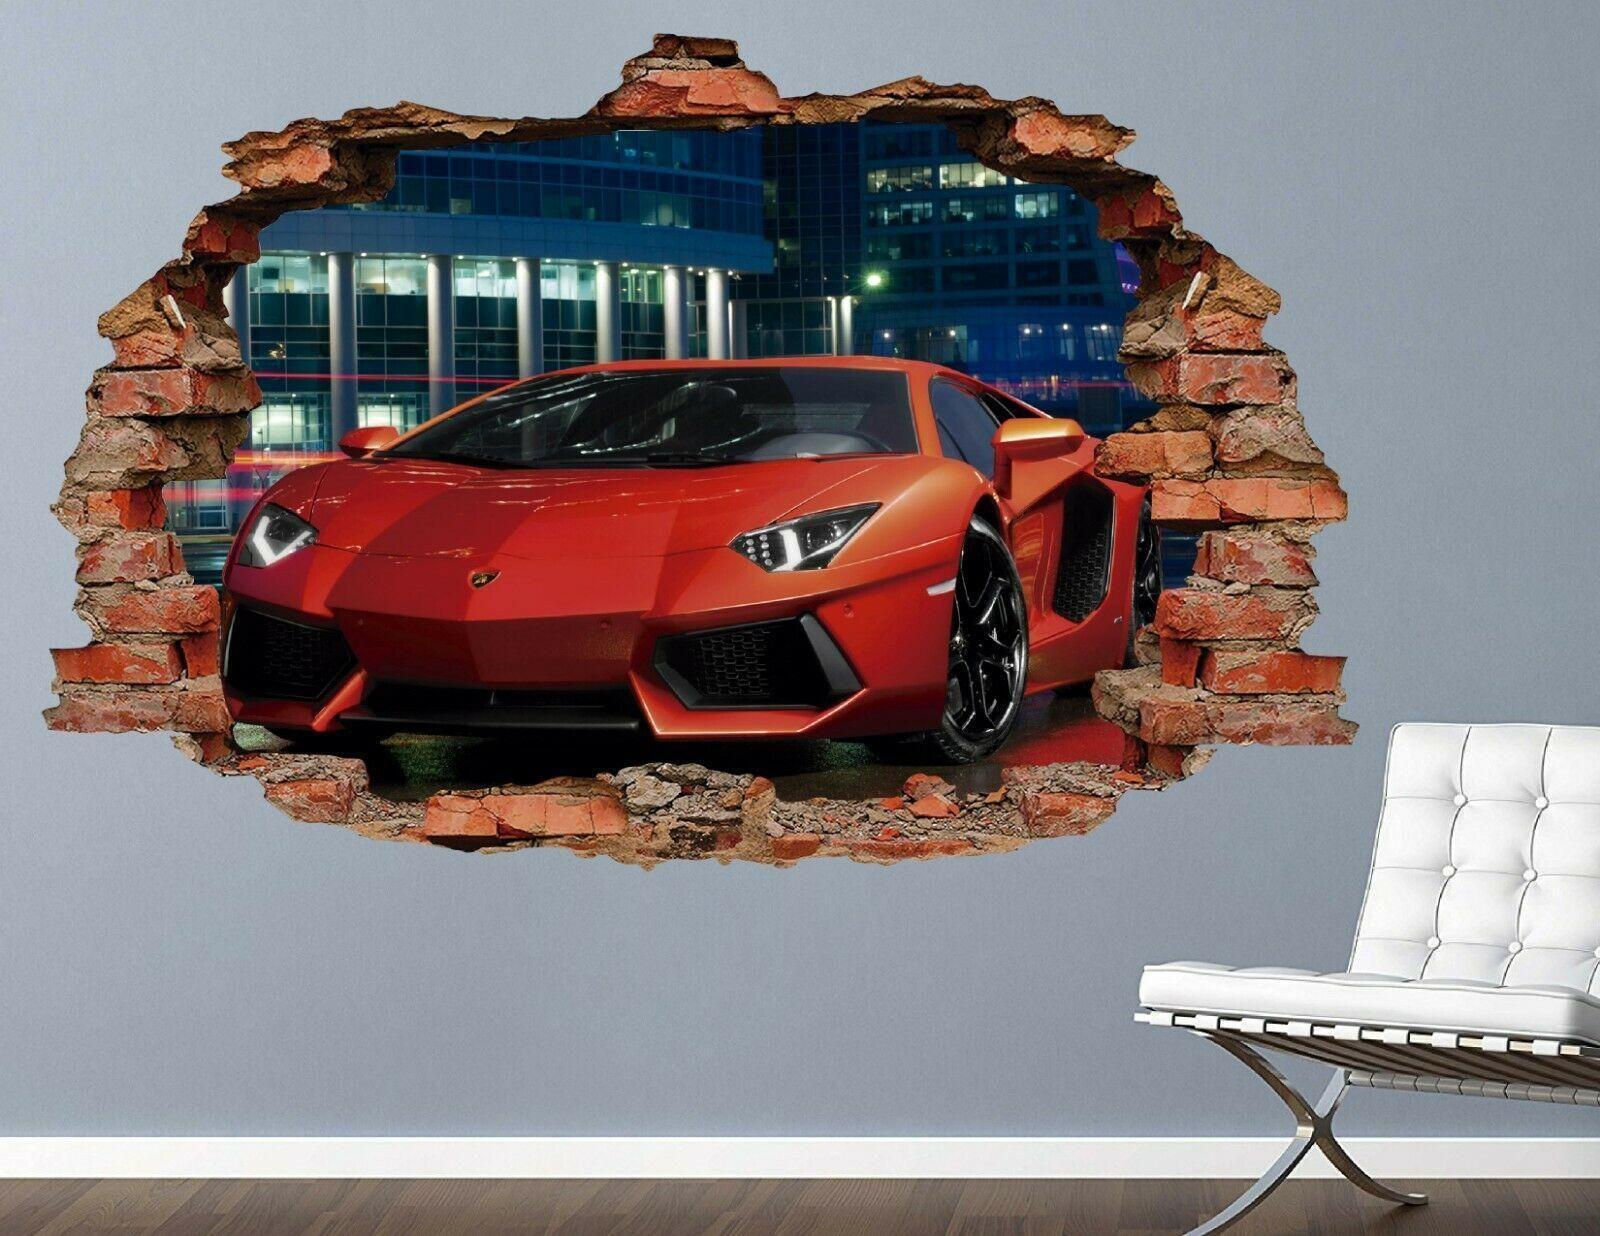 Photo of Ferrari Red Sports Custom Wall Decals 3D Wall Stickers Art AH518 – Small (Wide 20 x 12 Height)